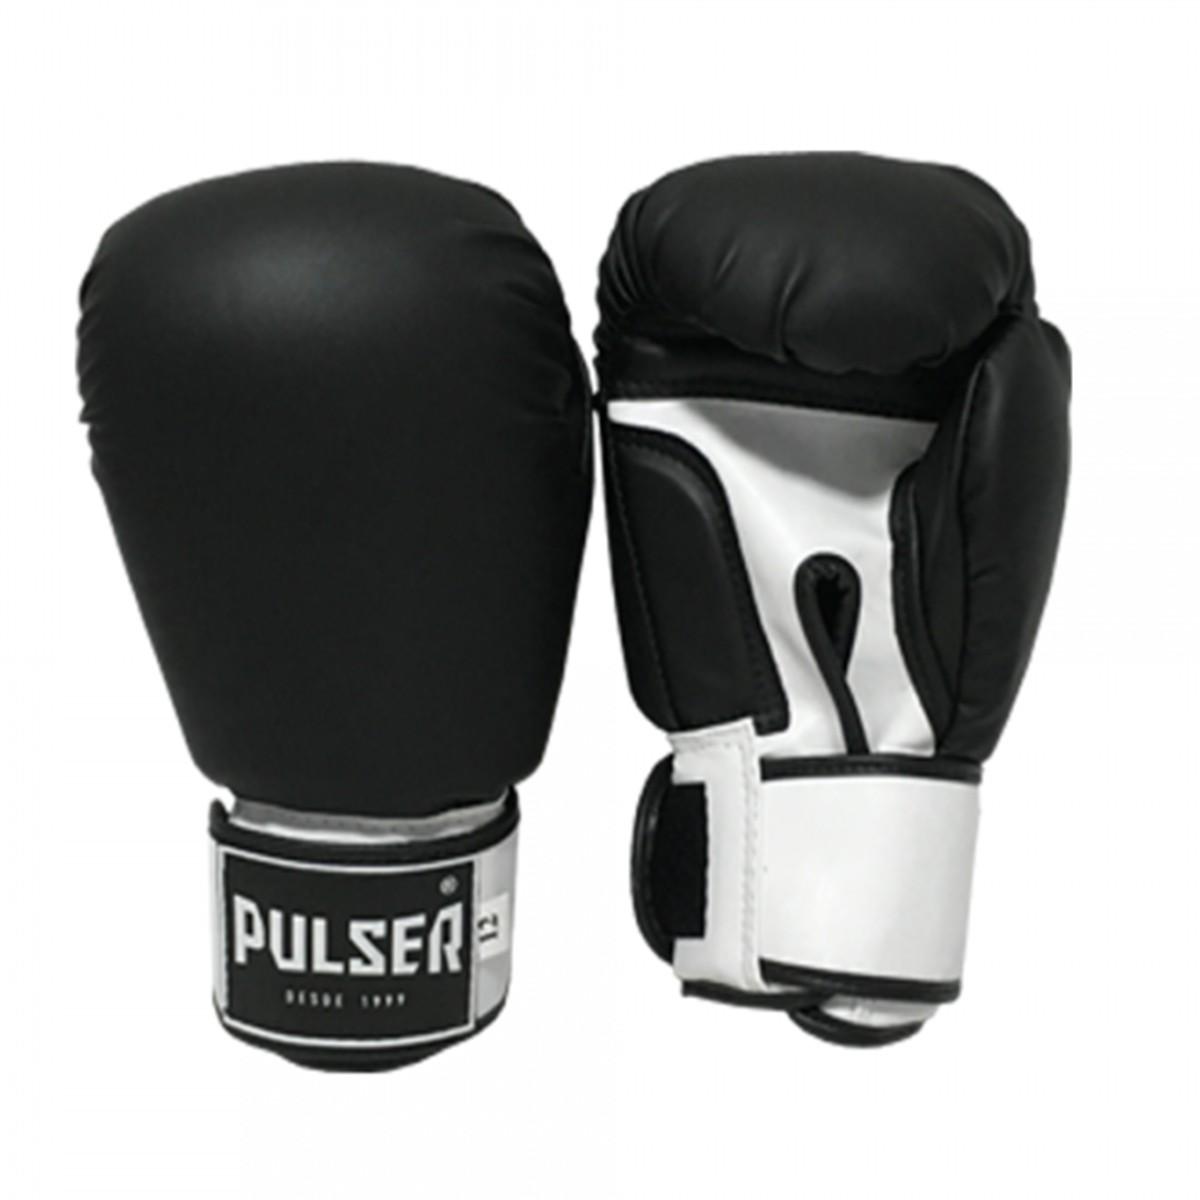 Luva de Boxe / Muay Thai 14oz - Preto - Pulser  - PRALUTA SHOP